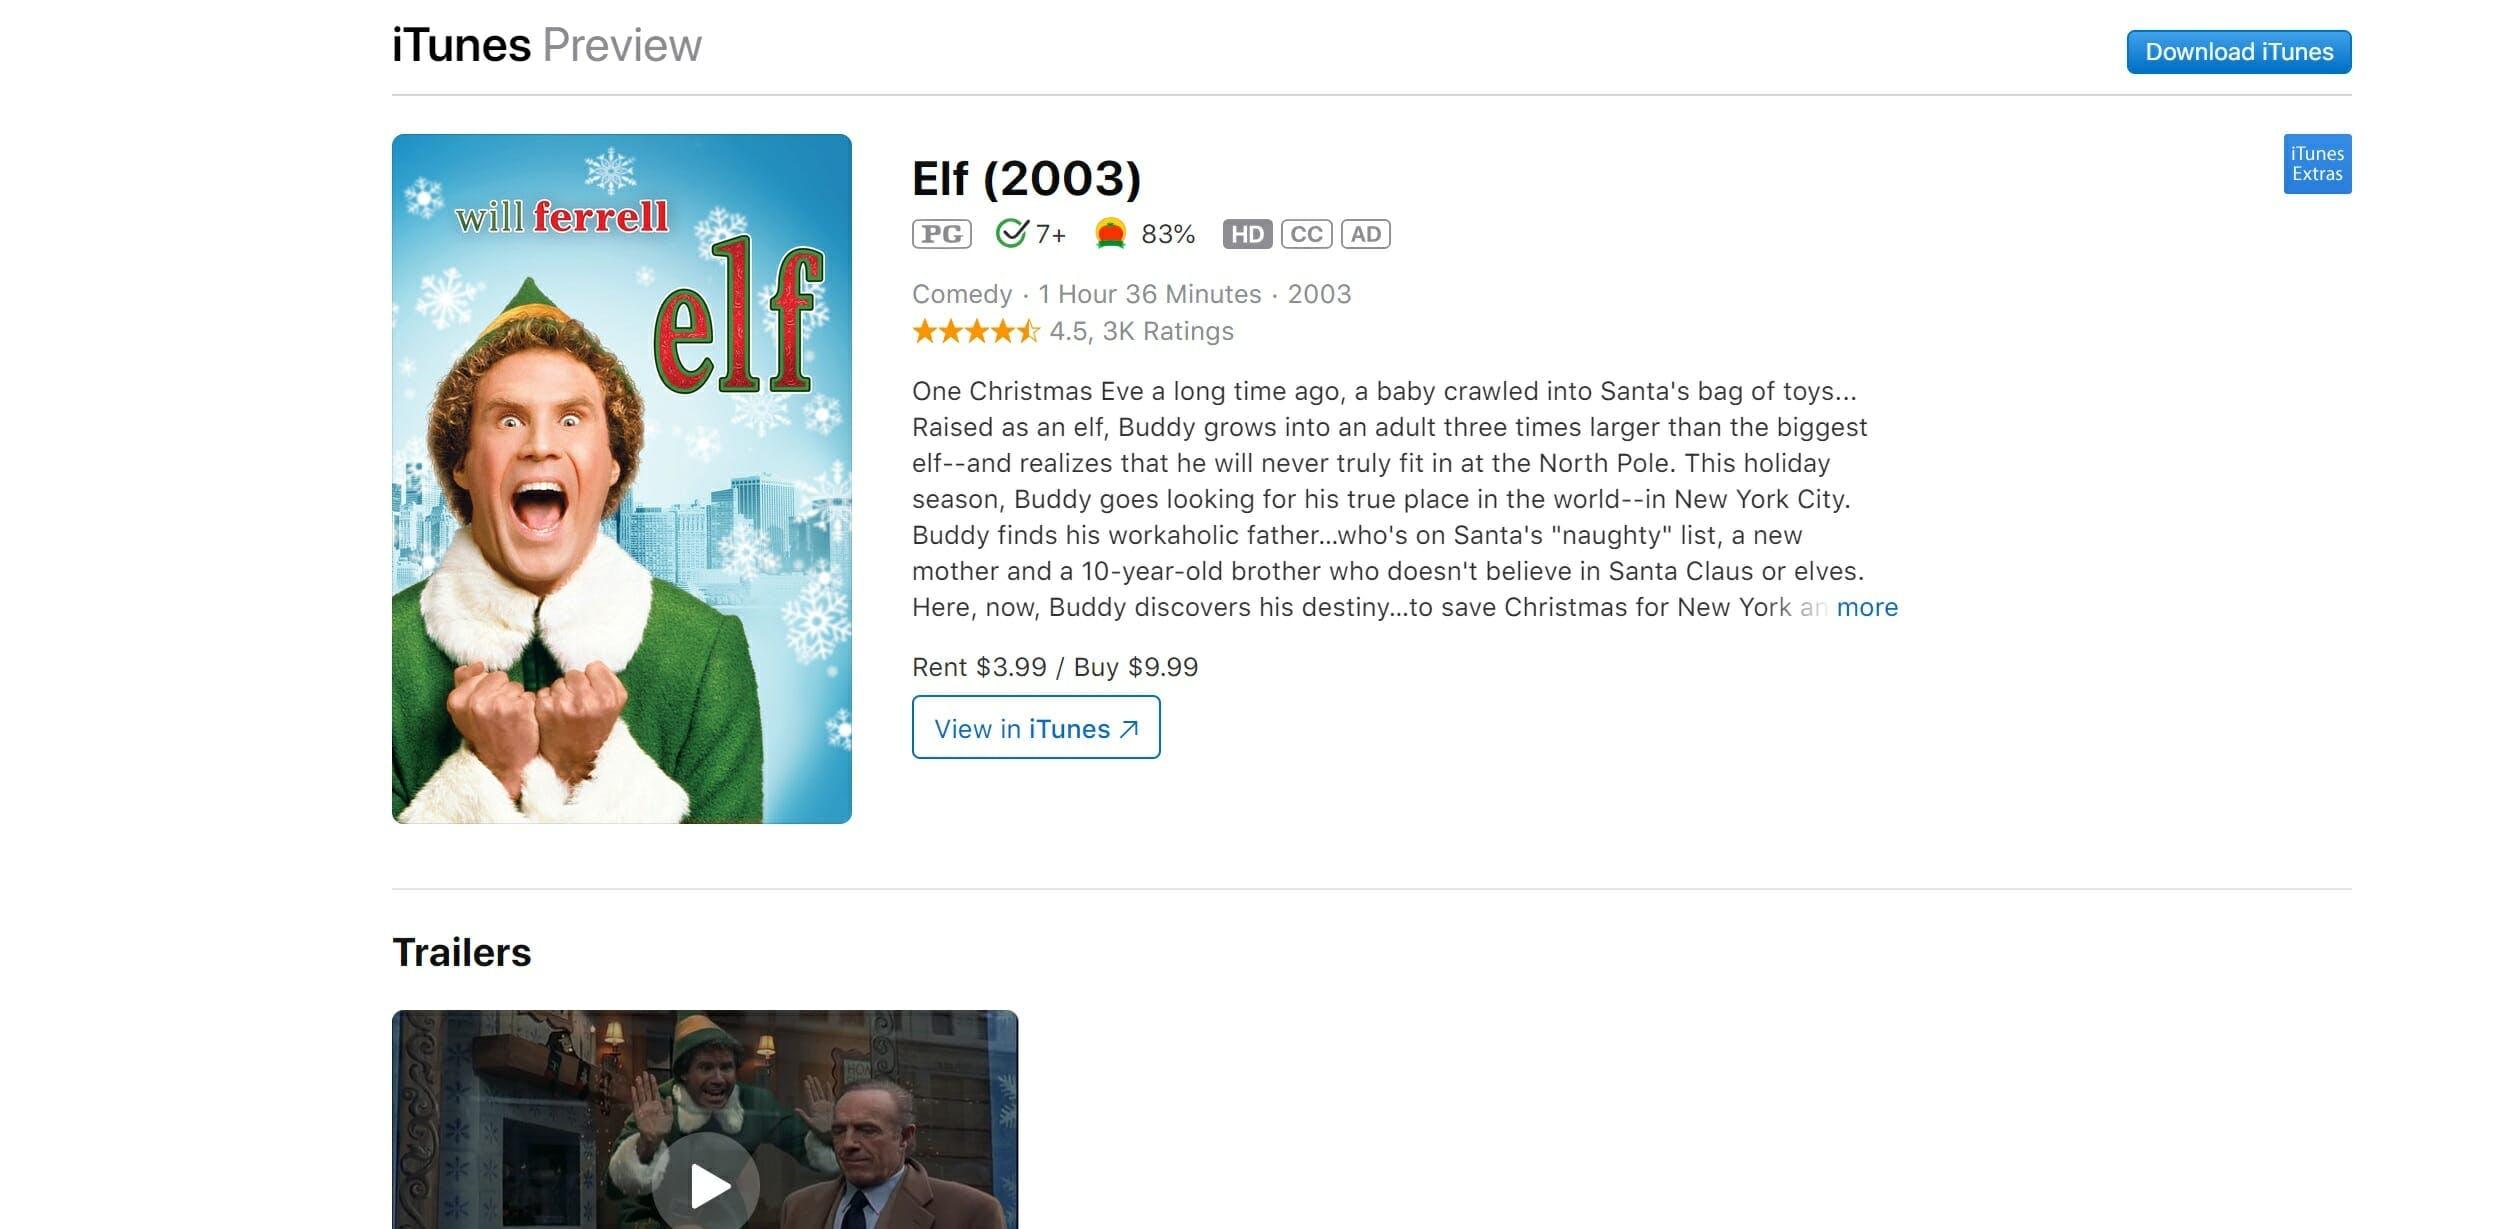 watch elf online free - itunes